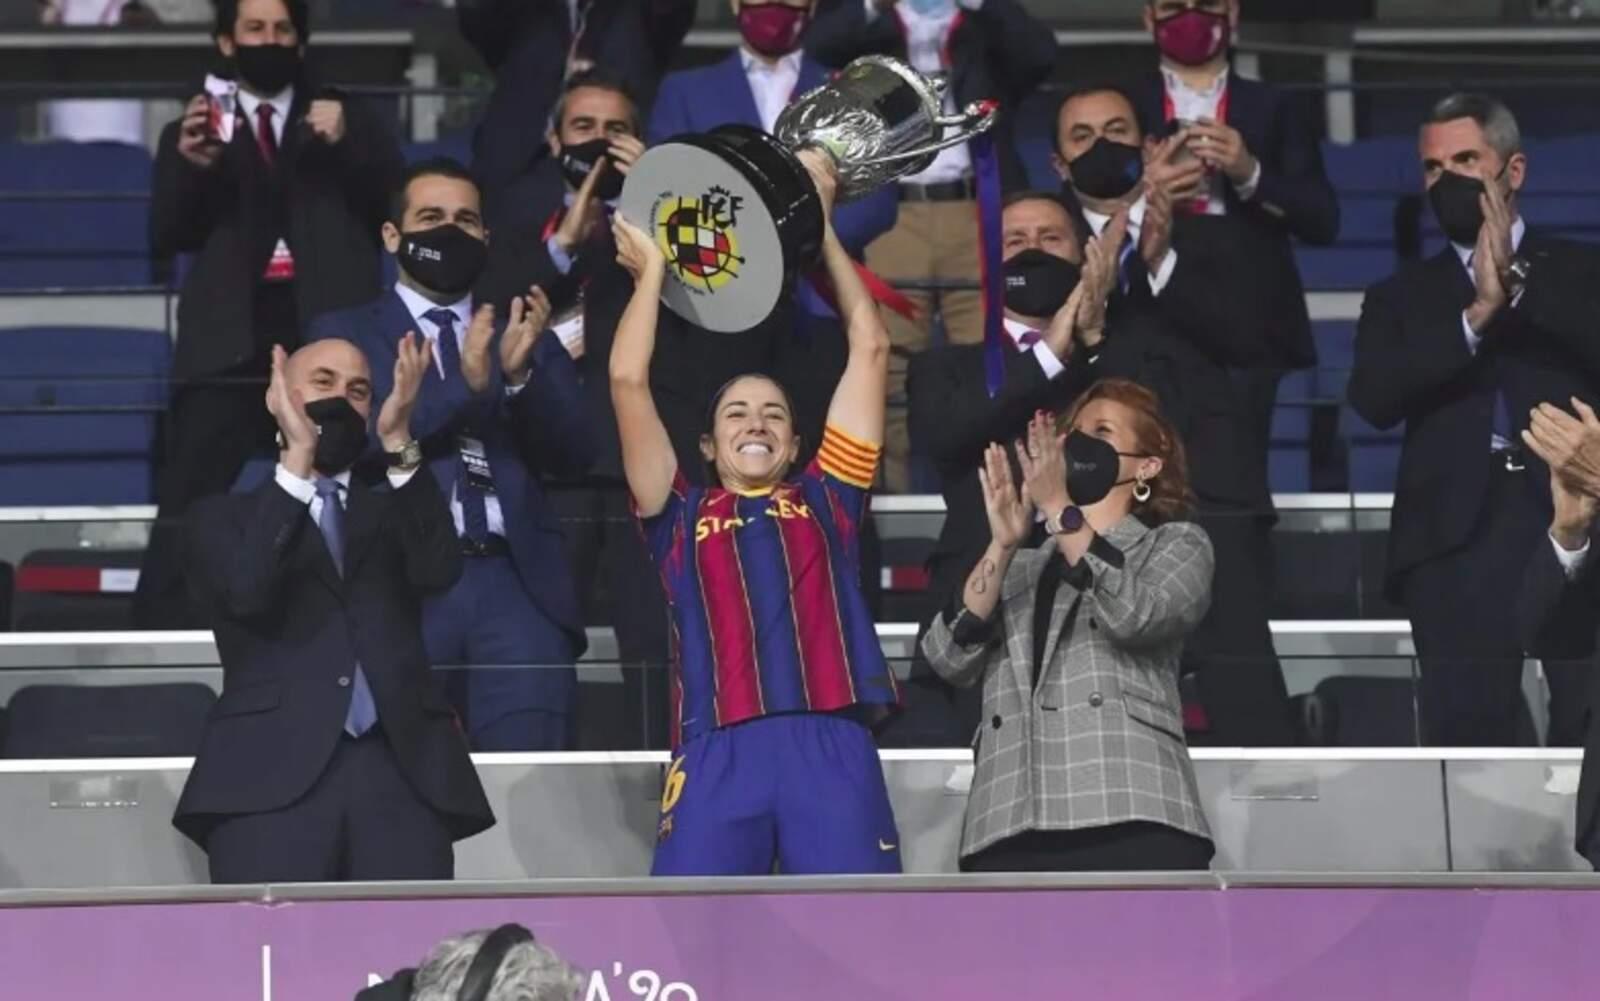 Vicky Losada enlairant la Copa de la Reina